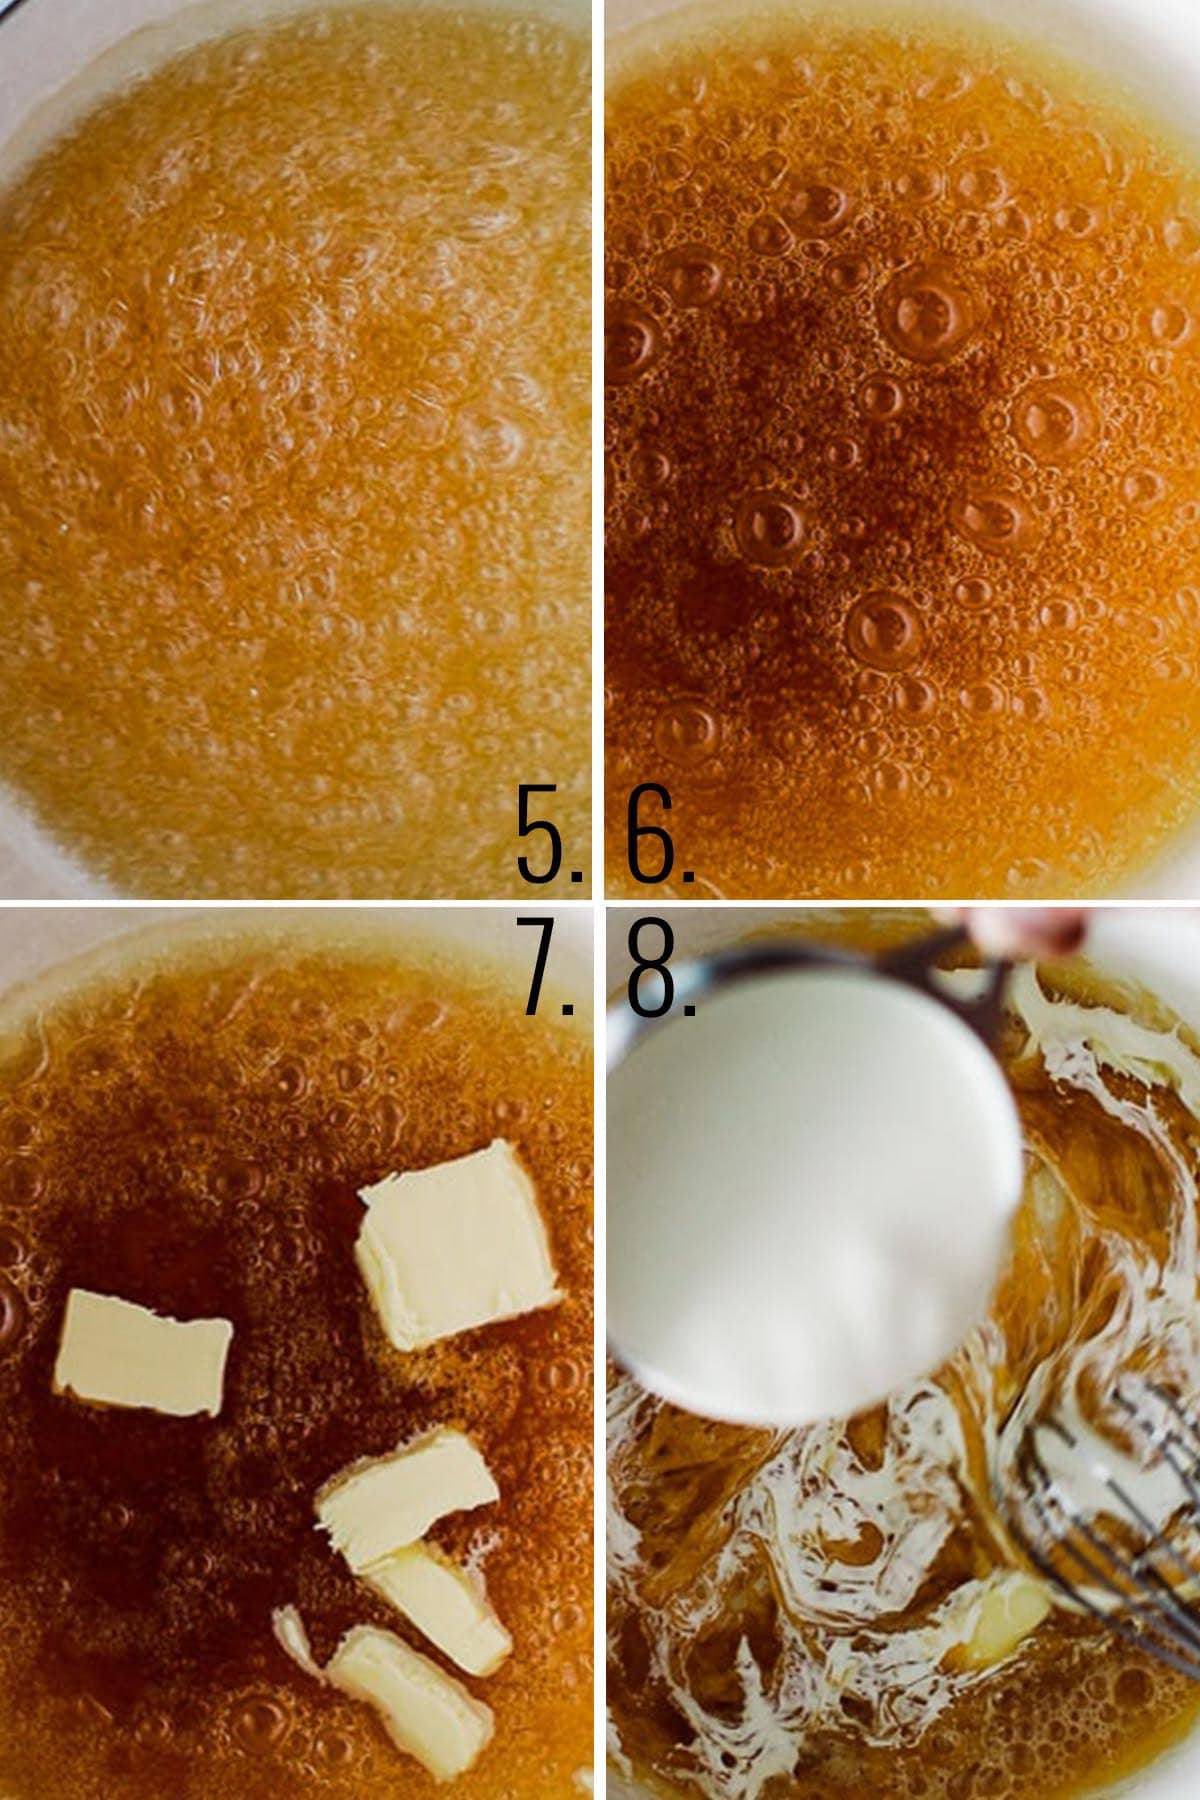 How to make caramel - darken, add butter and cream.